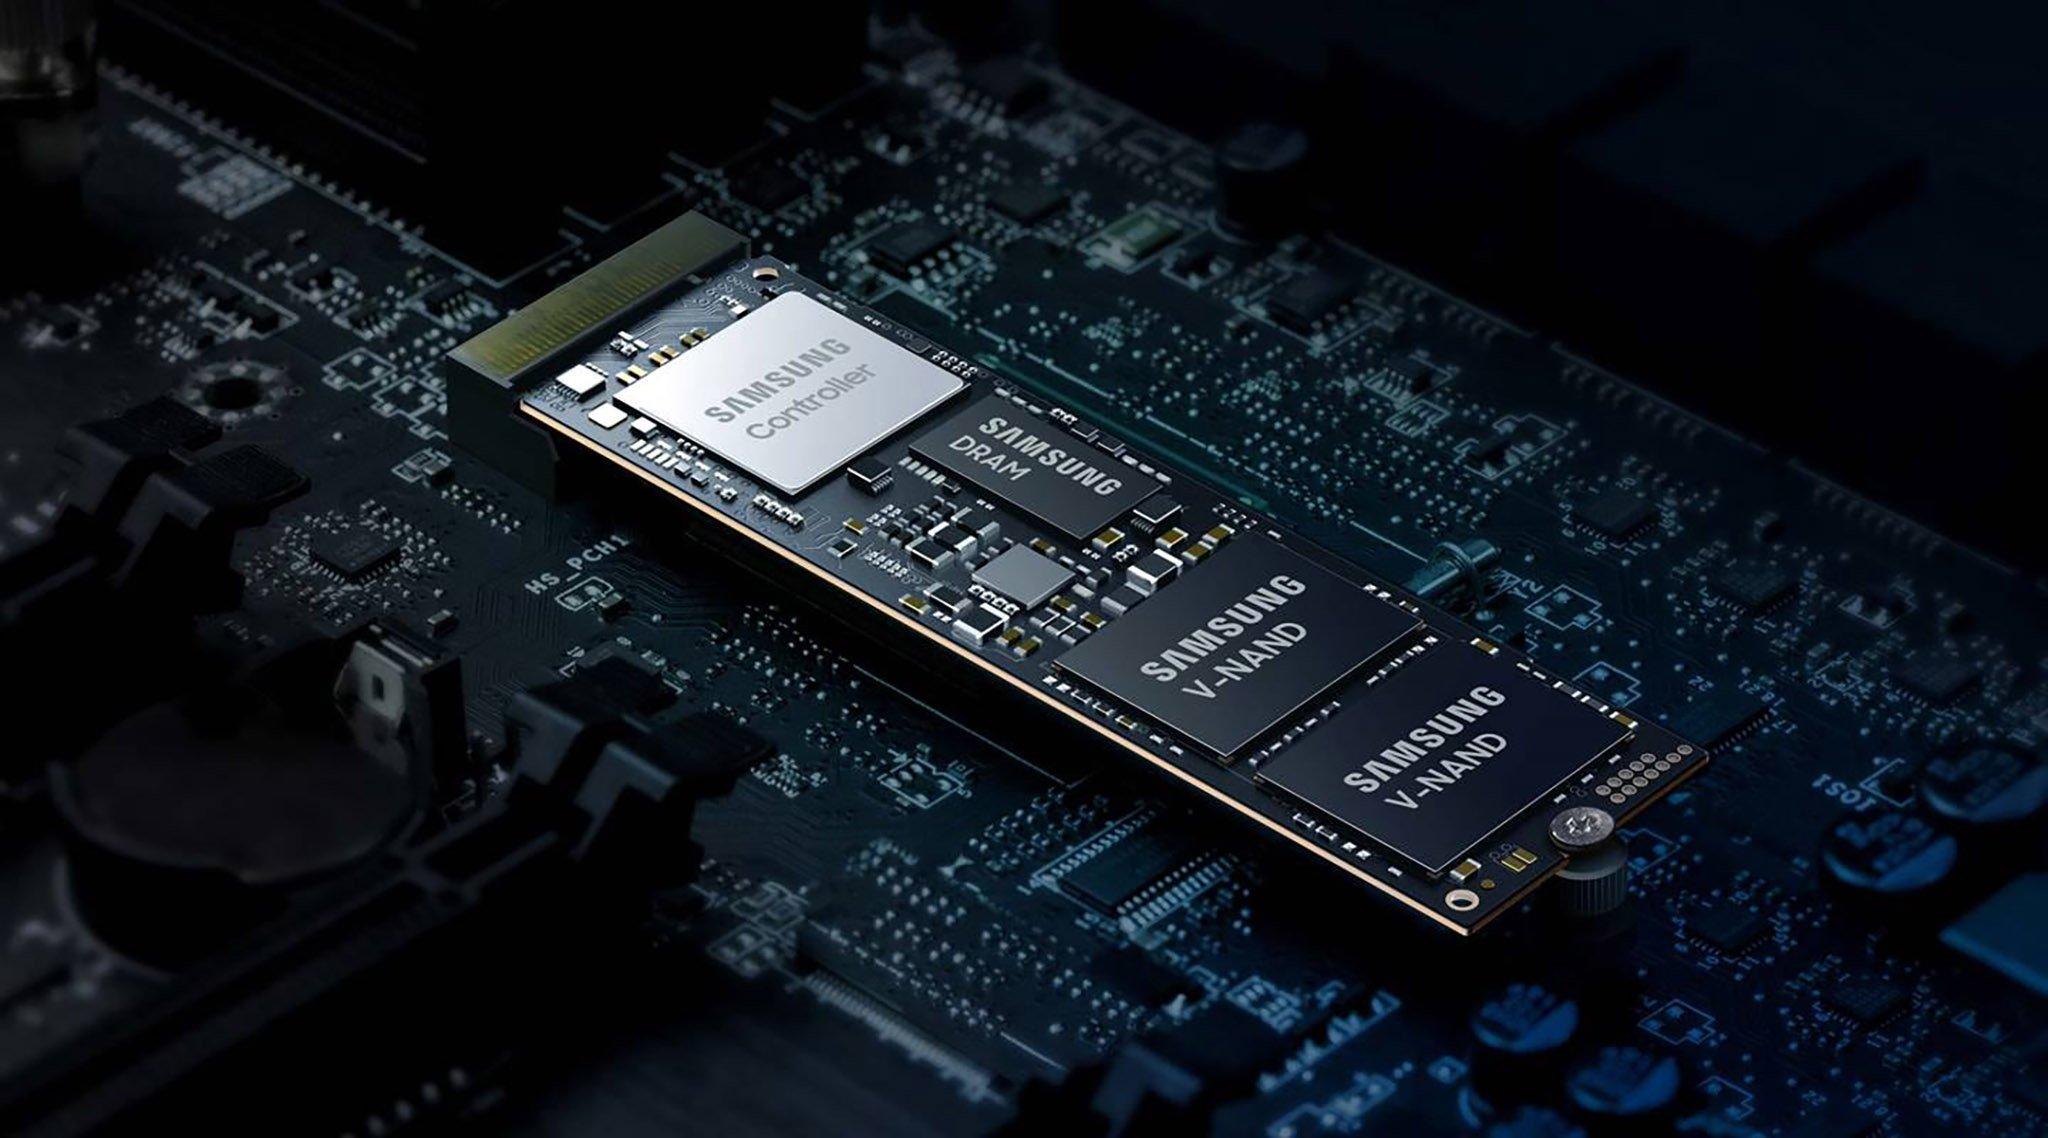 Samsung готовит SSD с 176-слойной флэш-памятью V-NAND и интерфейсами PCIe 4.0 и 5.0 - ITC.ua